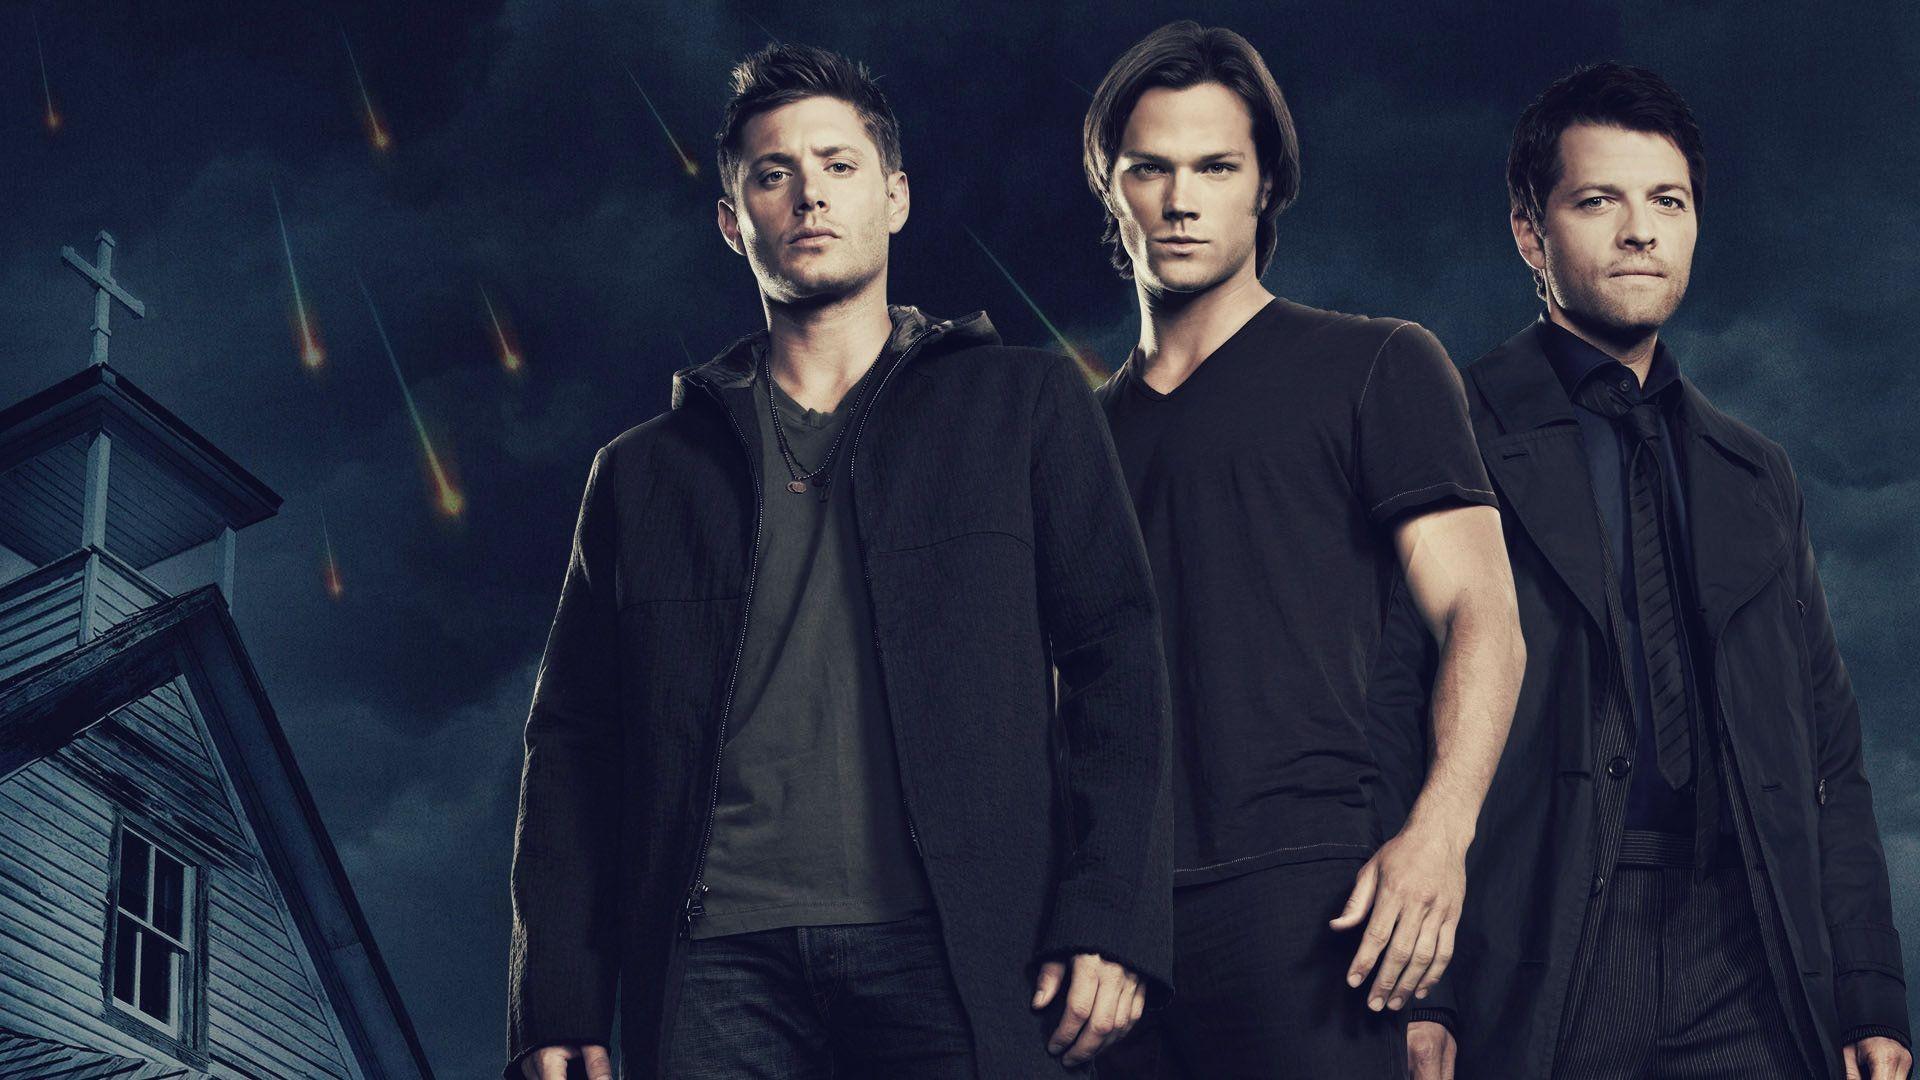 Supernatural – Supernatural Wallpaper (36002635) – Fanpop